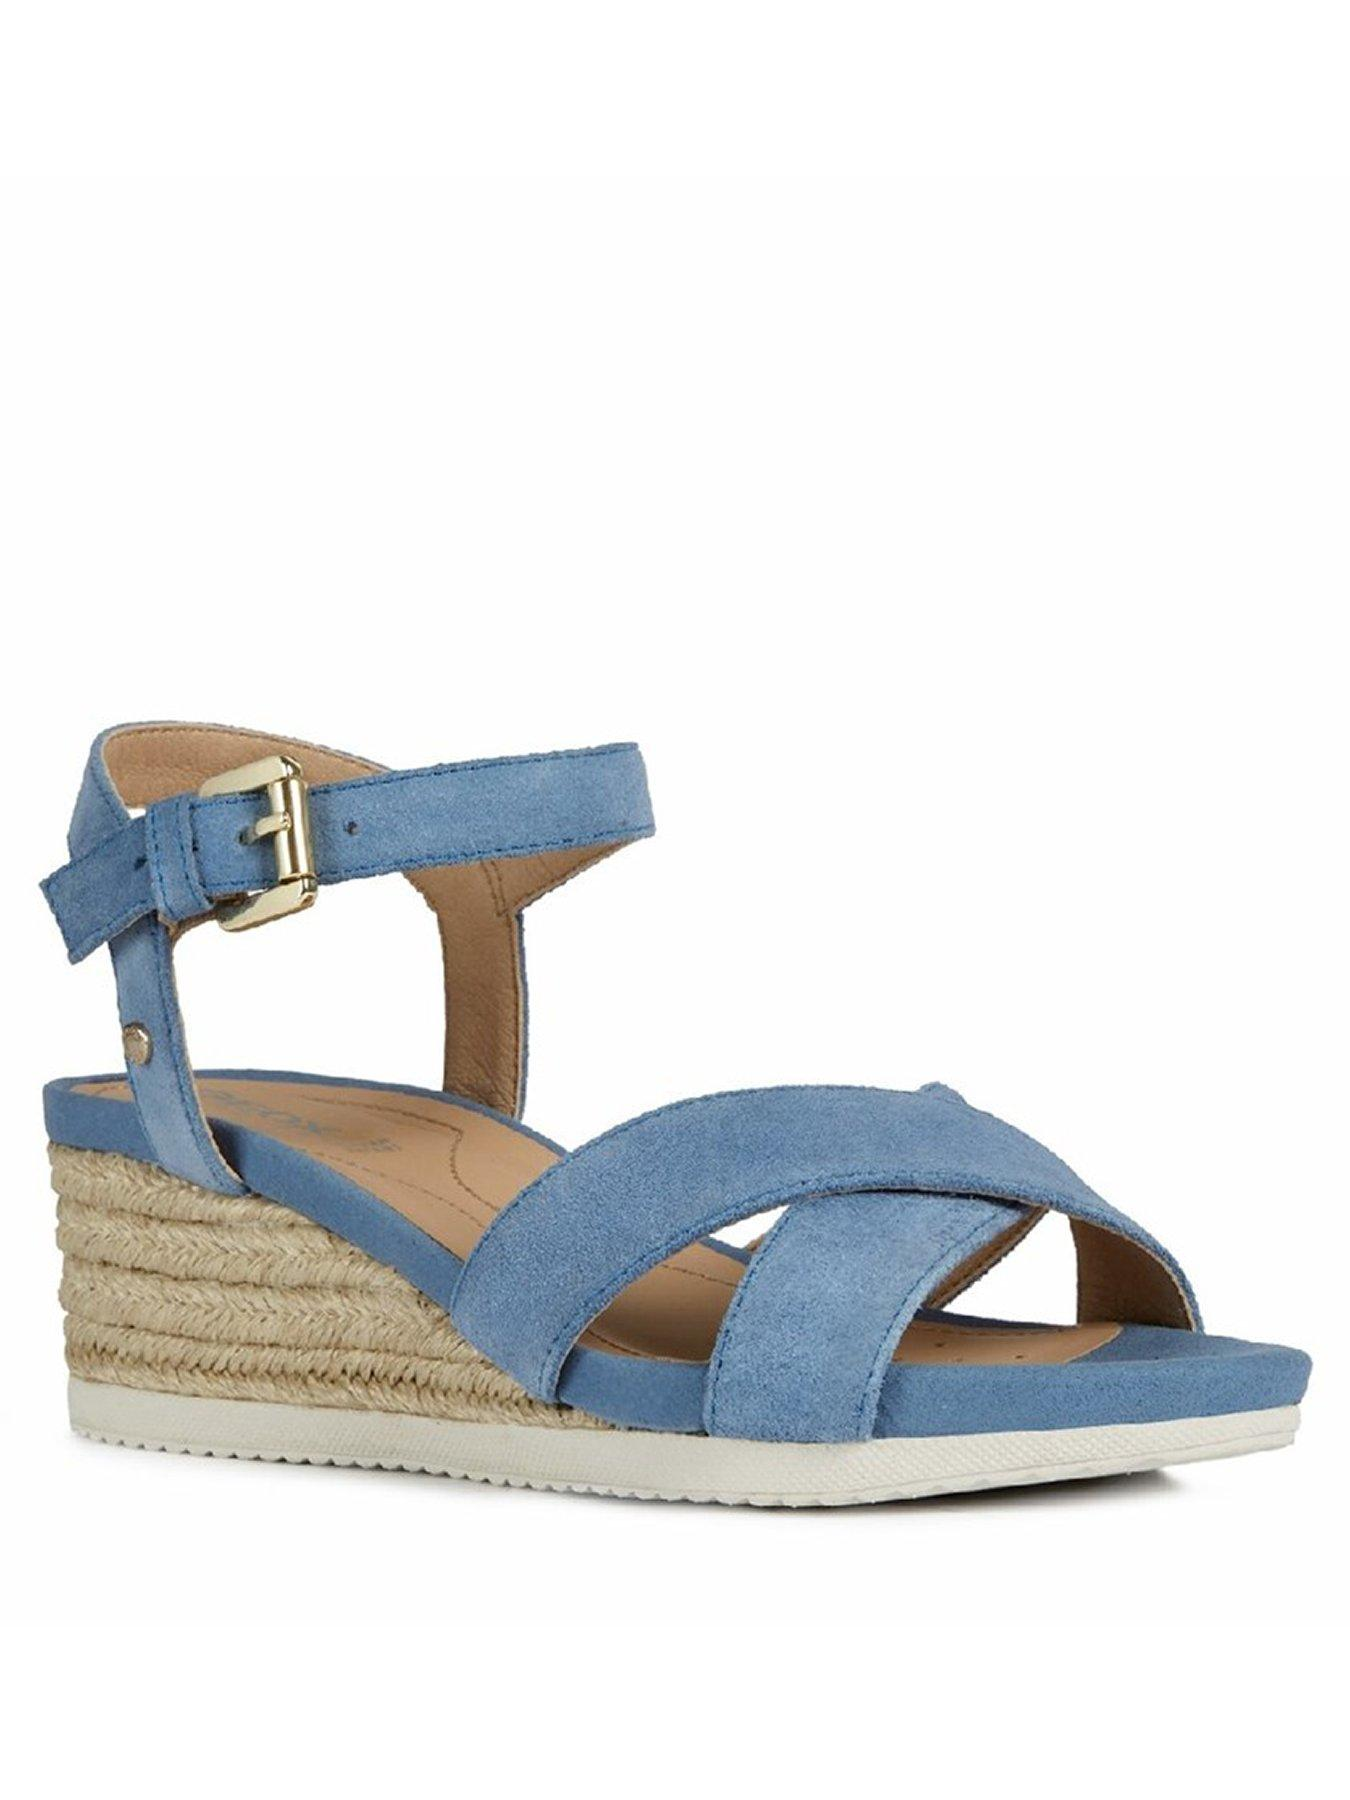 Blue | Sandals \u0026 flip flops | Shoes